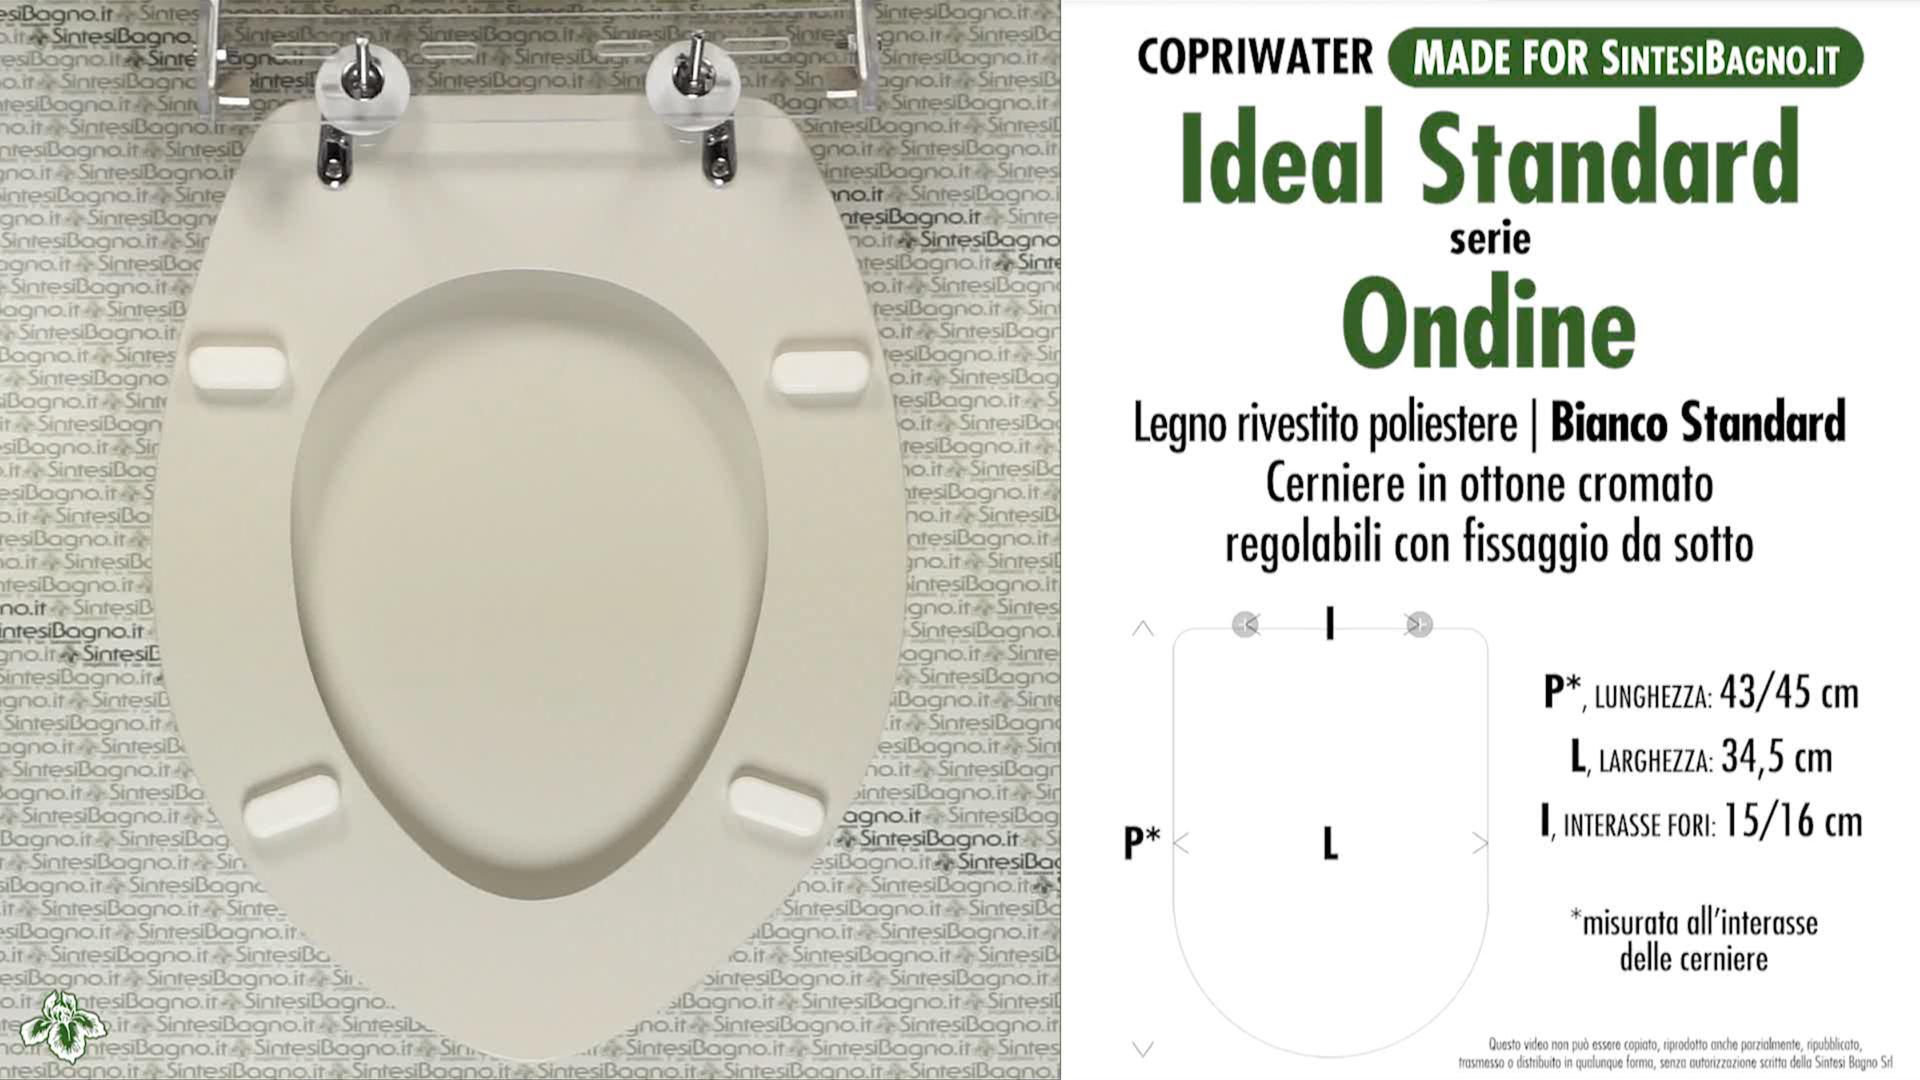 SCHEDA TECNICA MISURE copriwater IDEAL STANDARD ONDINE